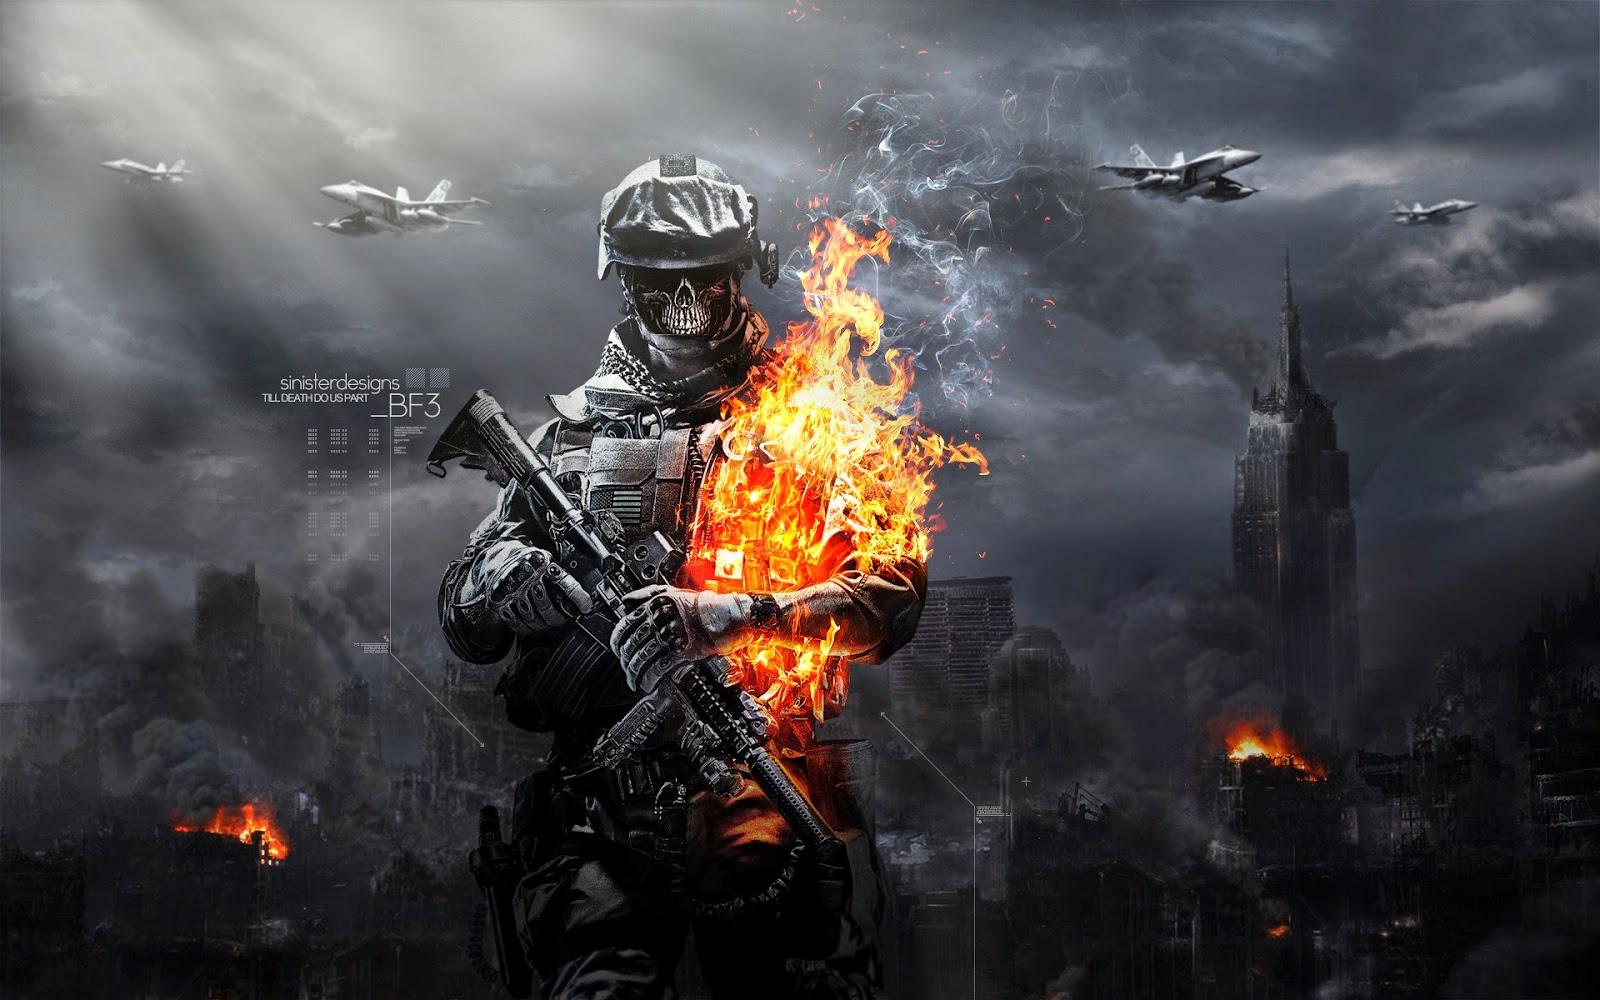 GTA IV shaking Screen problem - Anti piracy - Save game